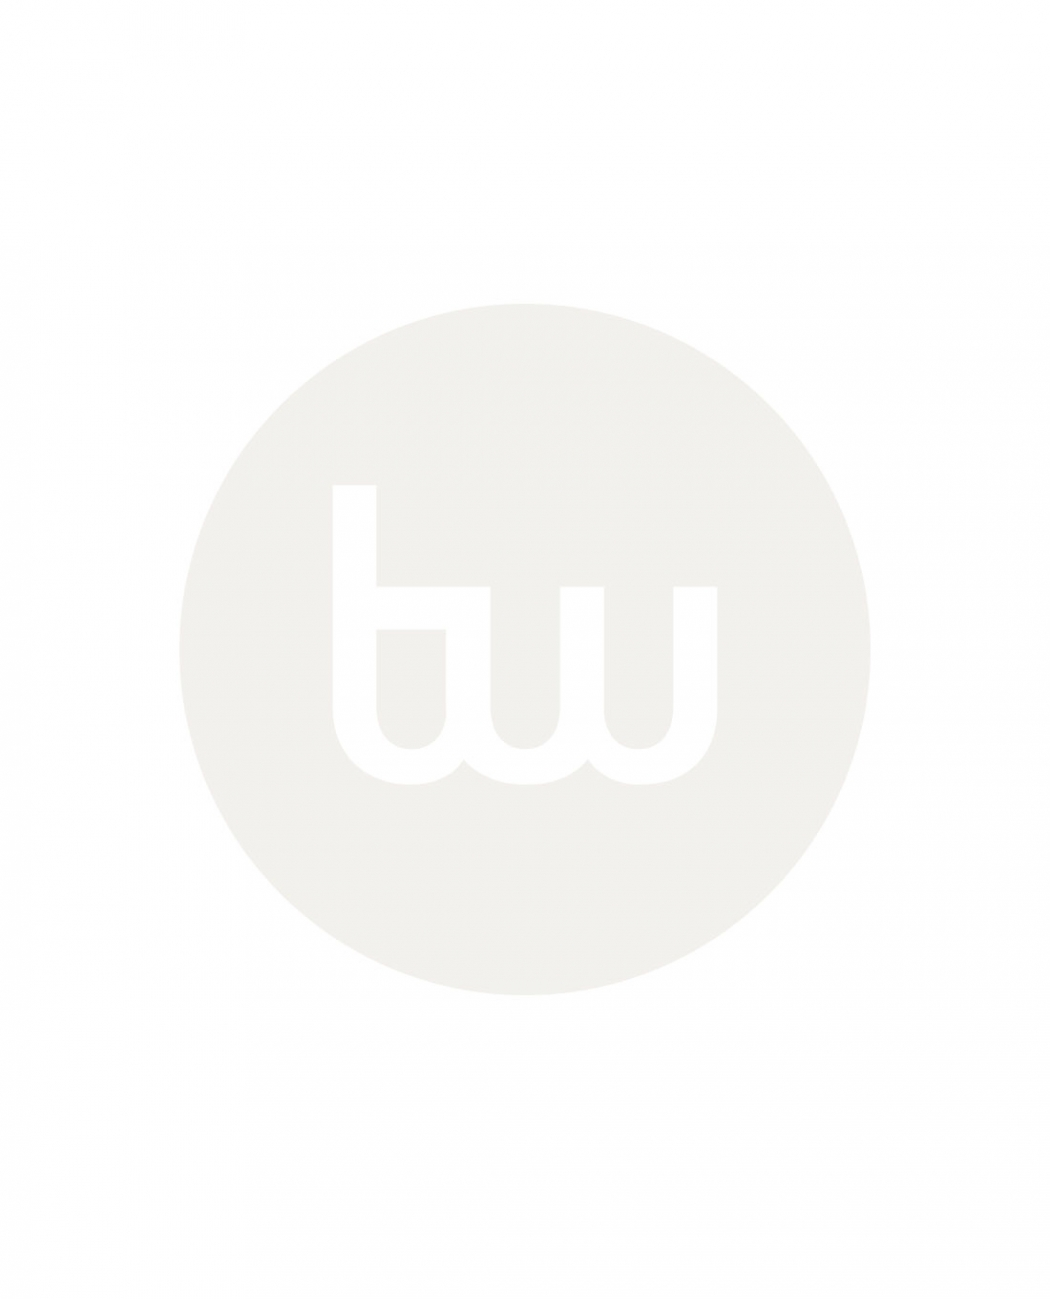 Niedlich M Si Rahmen 2.0 Ideen - Benutzerdefinierte Bilderrahmen ...